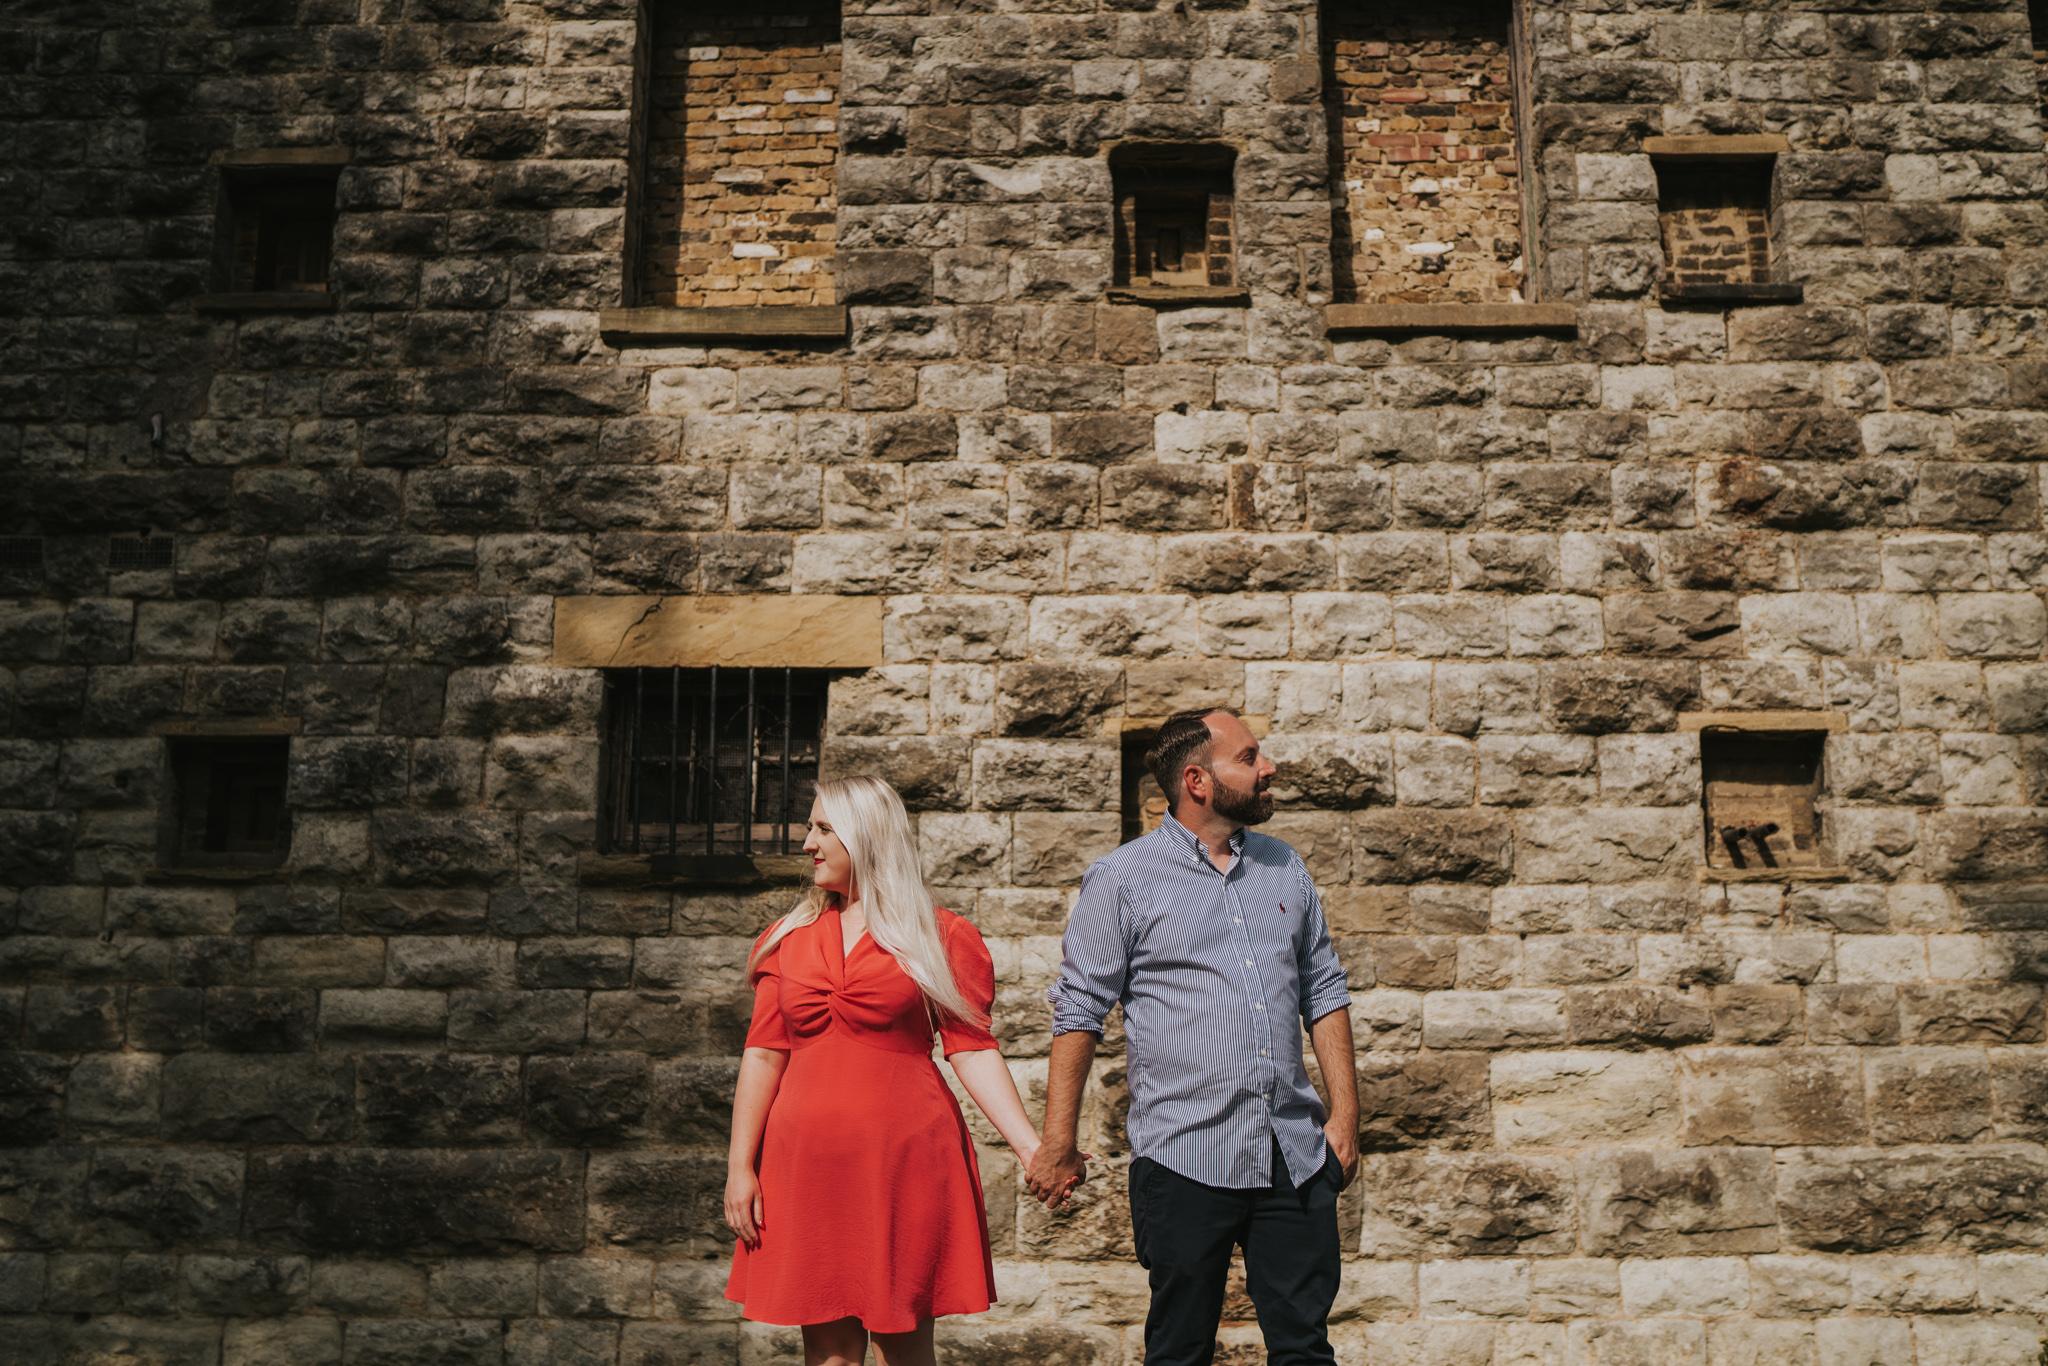 chara-neil-at-home-pre-wedding-session-cats-coalhouse-fort-grace-elizabeth-colchester-essex-alternative-wedding-lifestyle-photographer-essex-suffolk-norfolk-devon (26 of 47).jpg